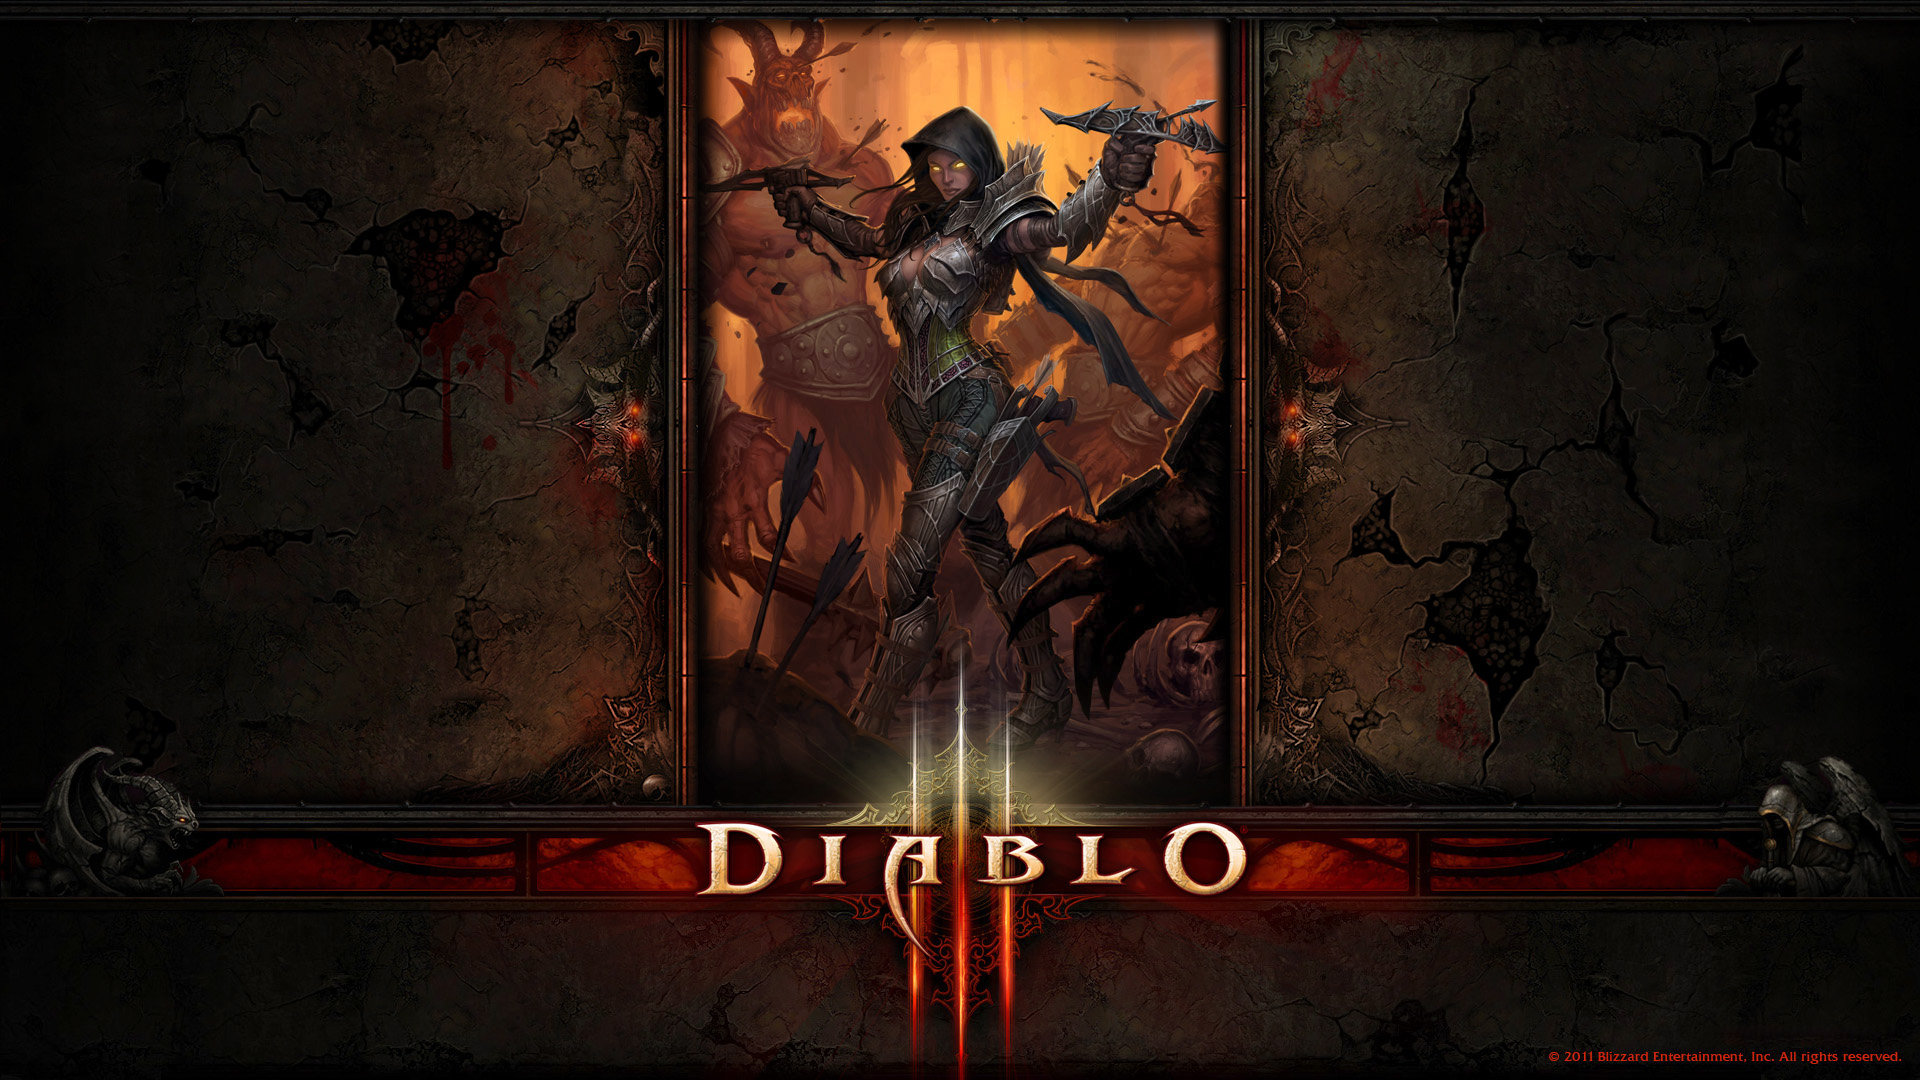 Diablo 3 wallpaper cartoon picture